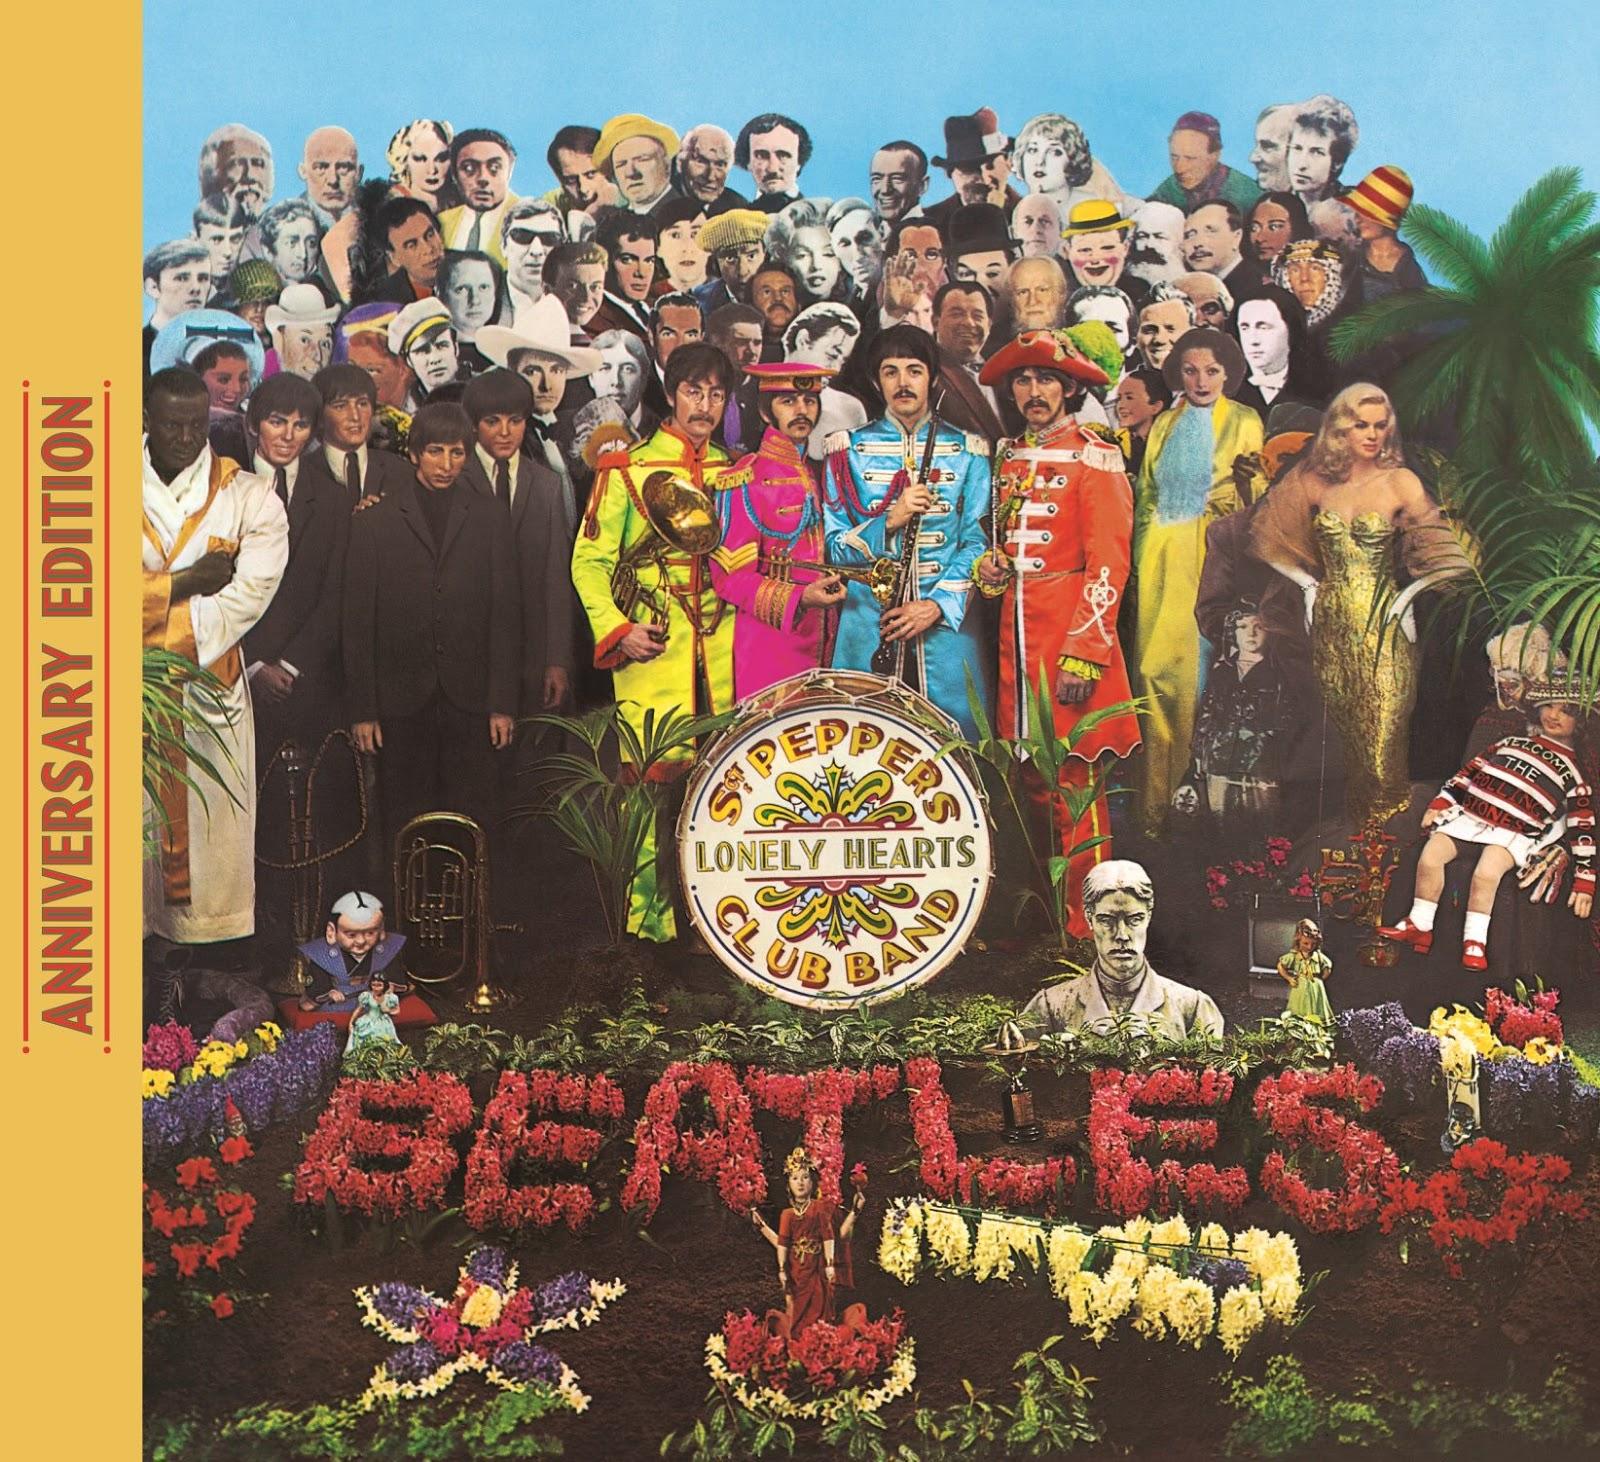 beatles discography download 320kbps